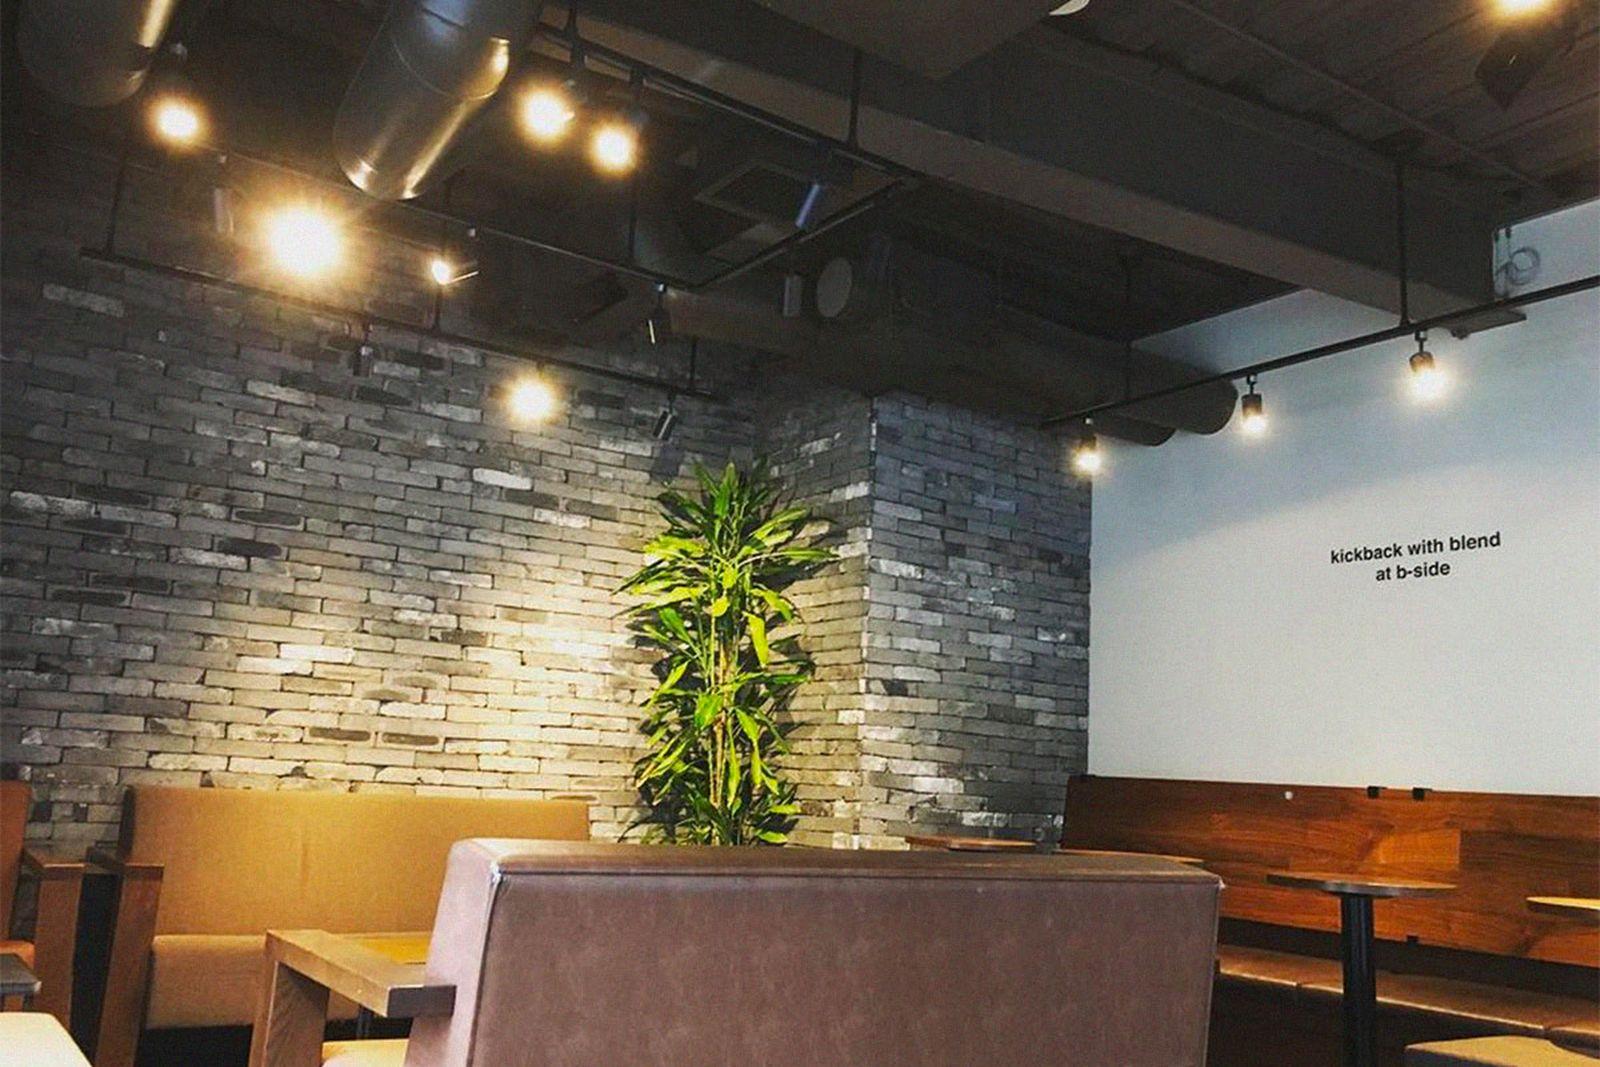 tokyo shopping guide Starbucks B Side by Hiroshi Fujiwara prov the real mccoys have a good time